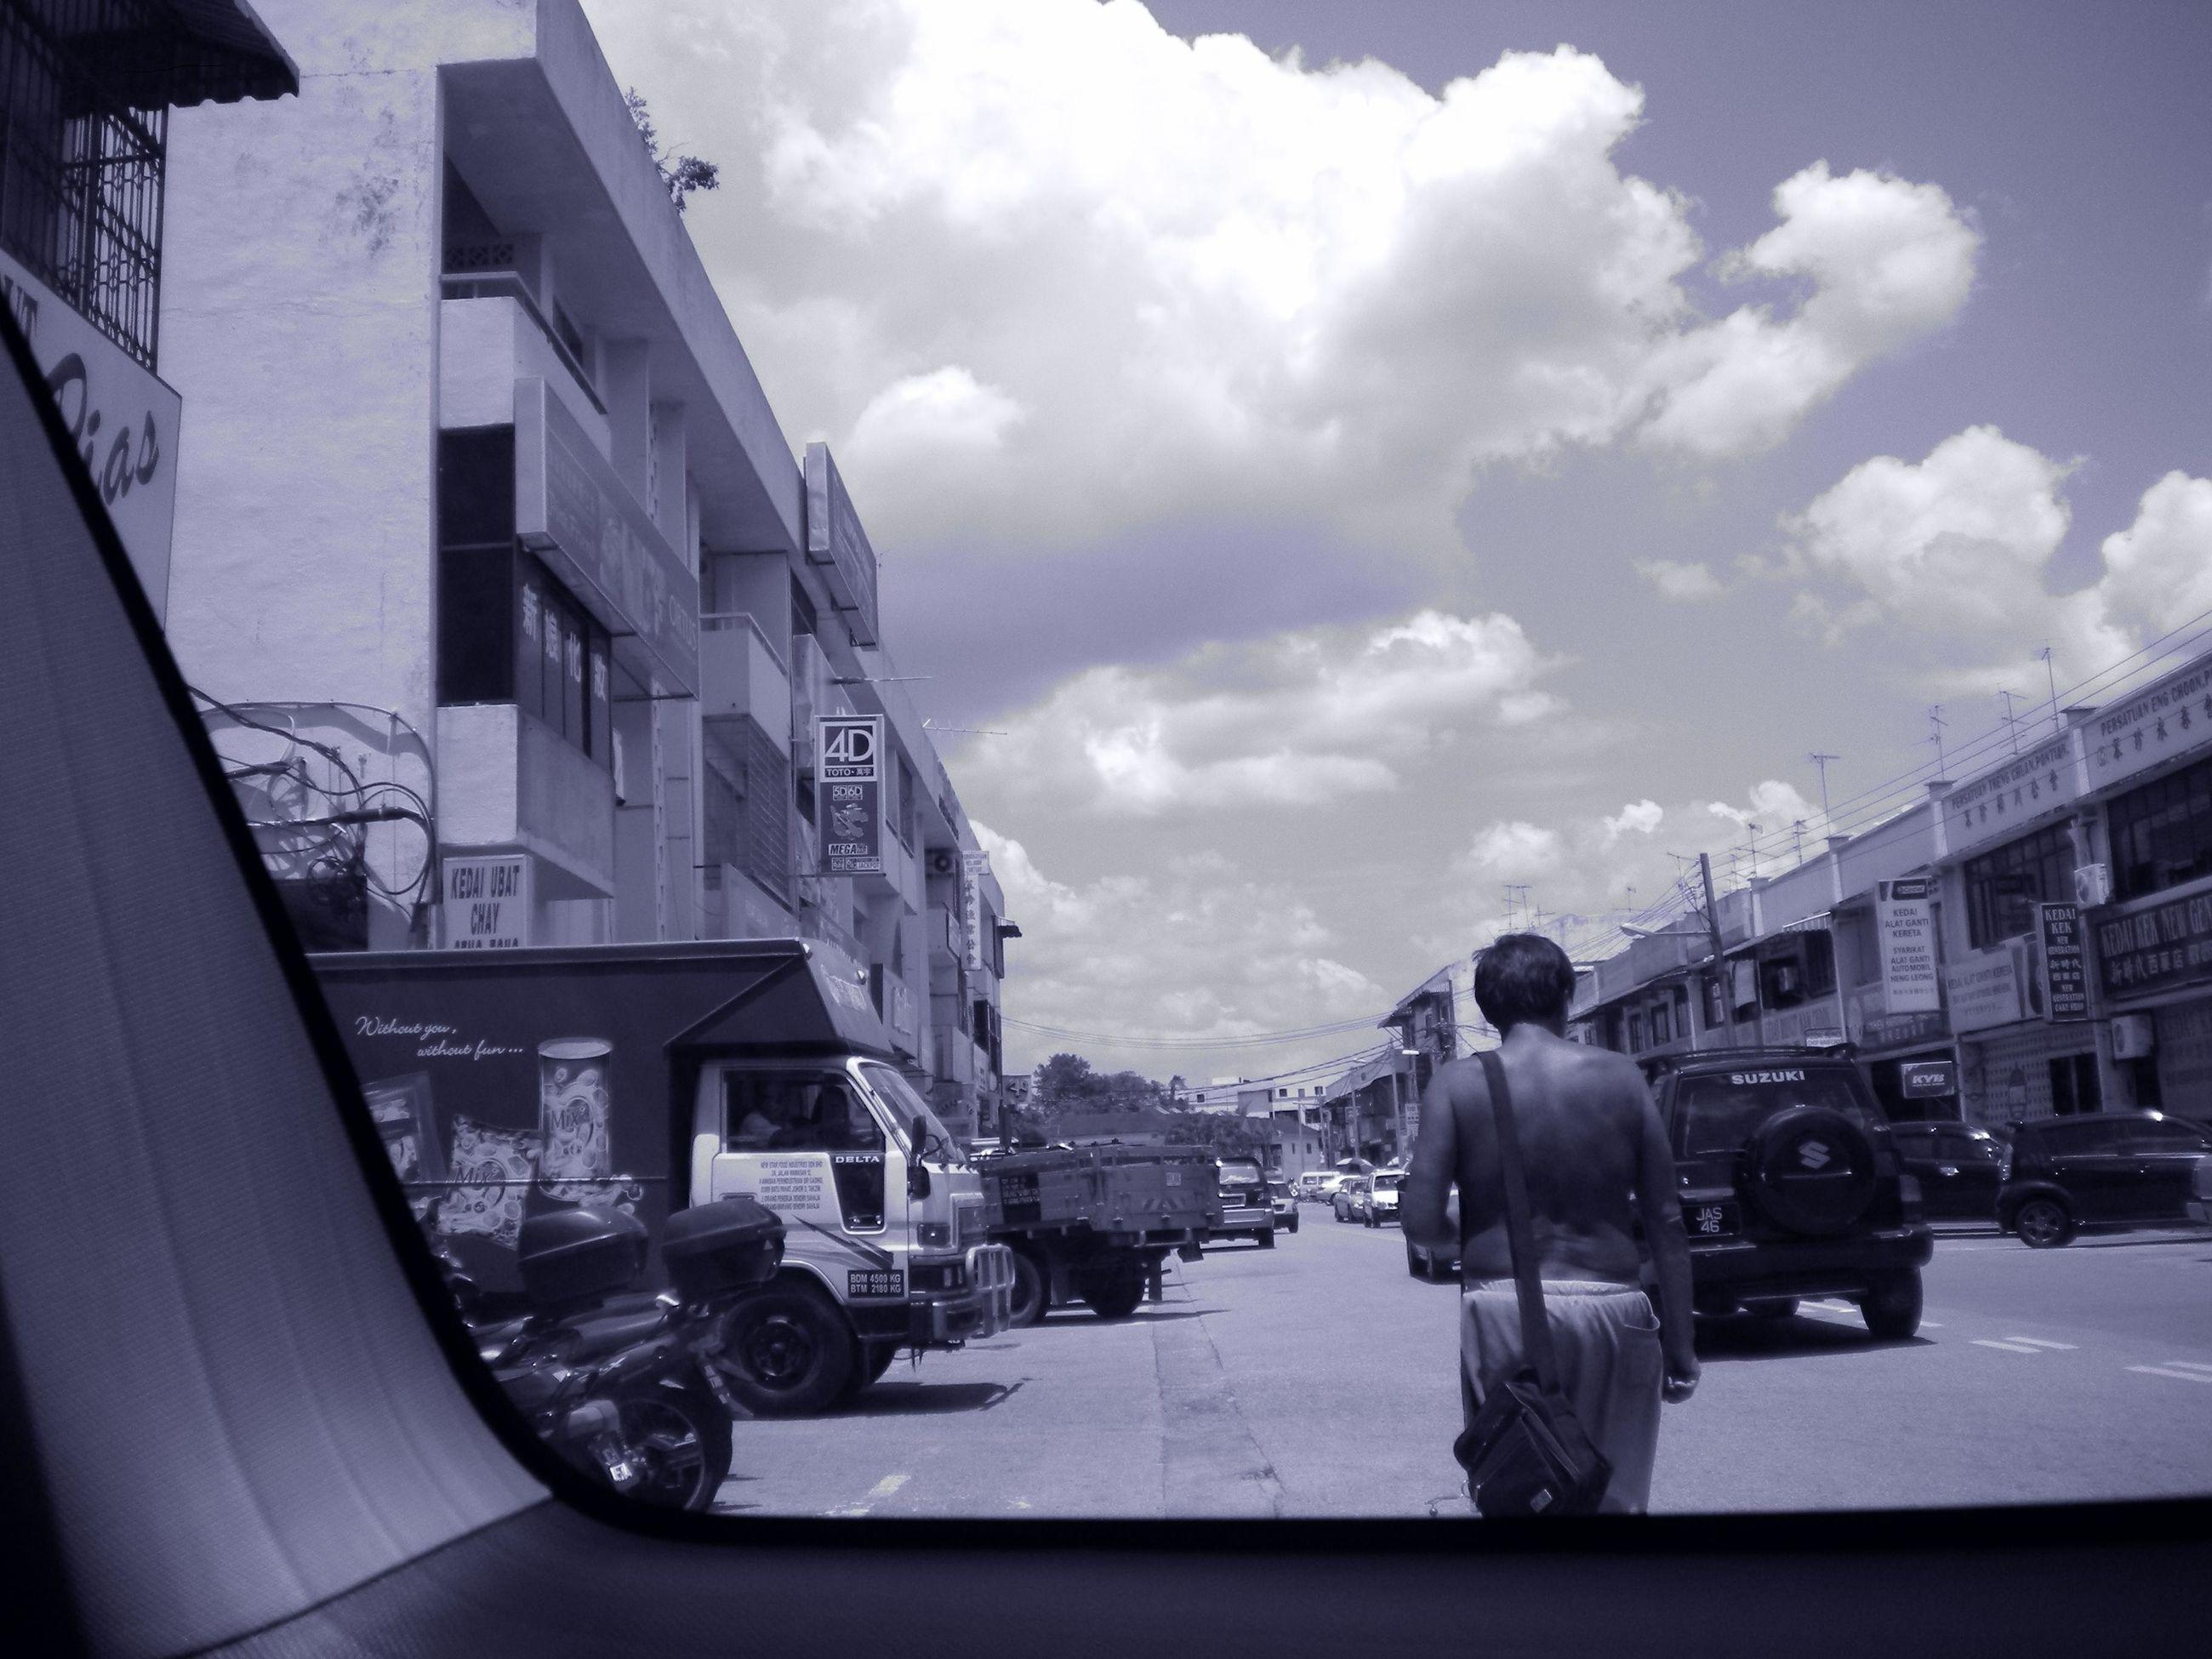 transportation, mode of transport, building exterior, land vehicle, architecture, car, built structure, sky, street, men, city, cloud - sky, lifestyles, city life, cloud, road, rear view, person